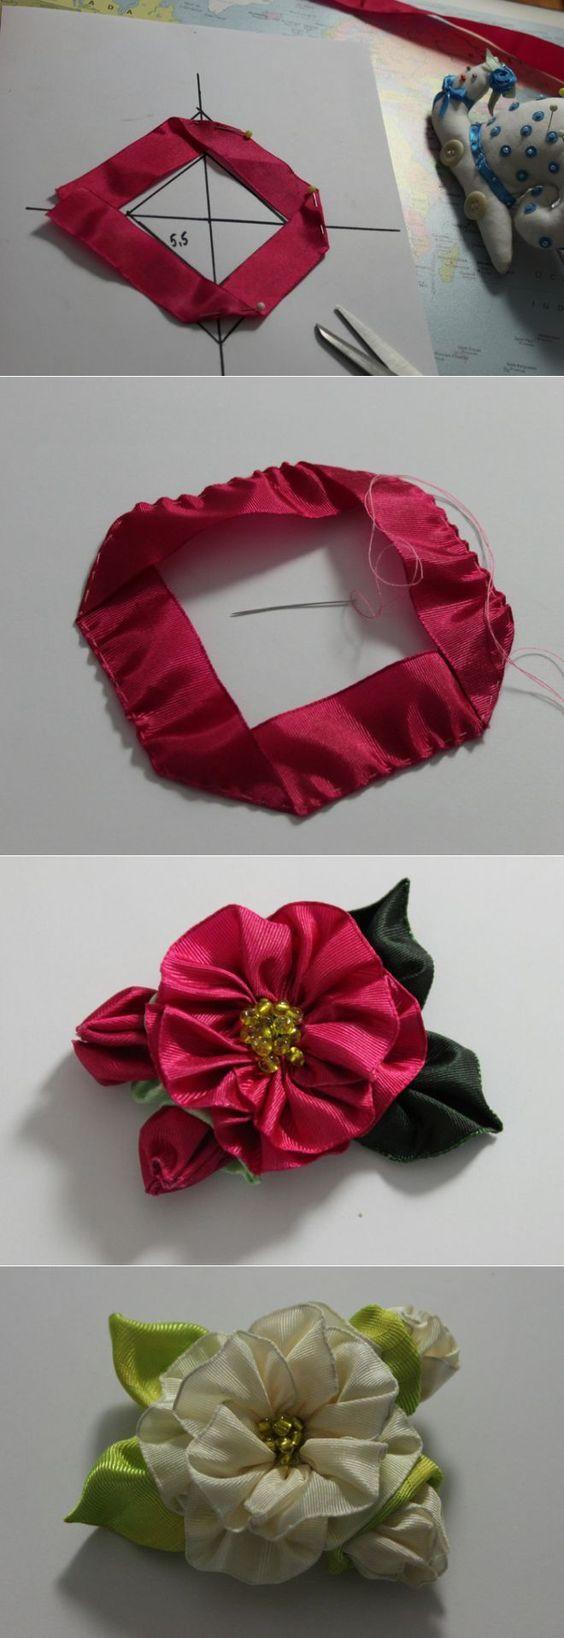 цветы из атласных лент мастер-класс